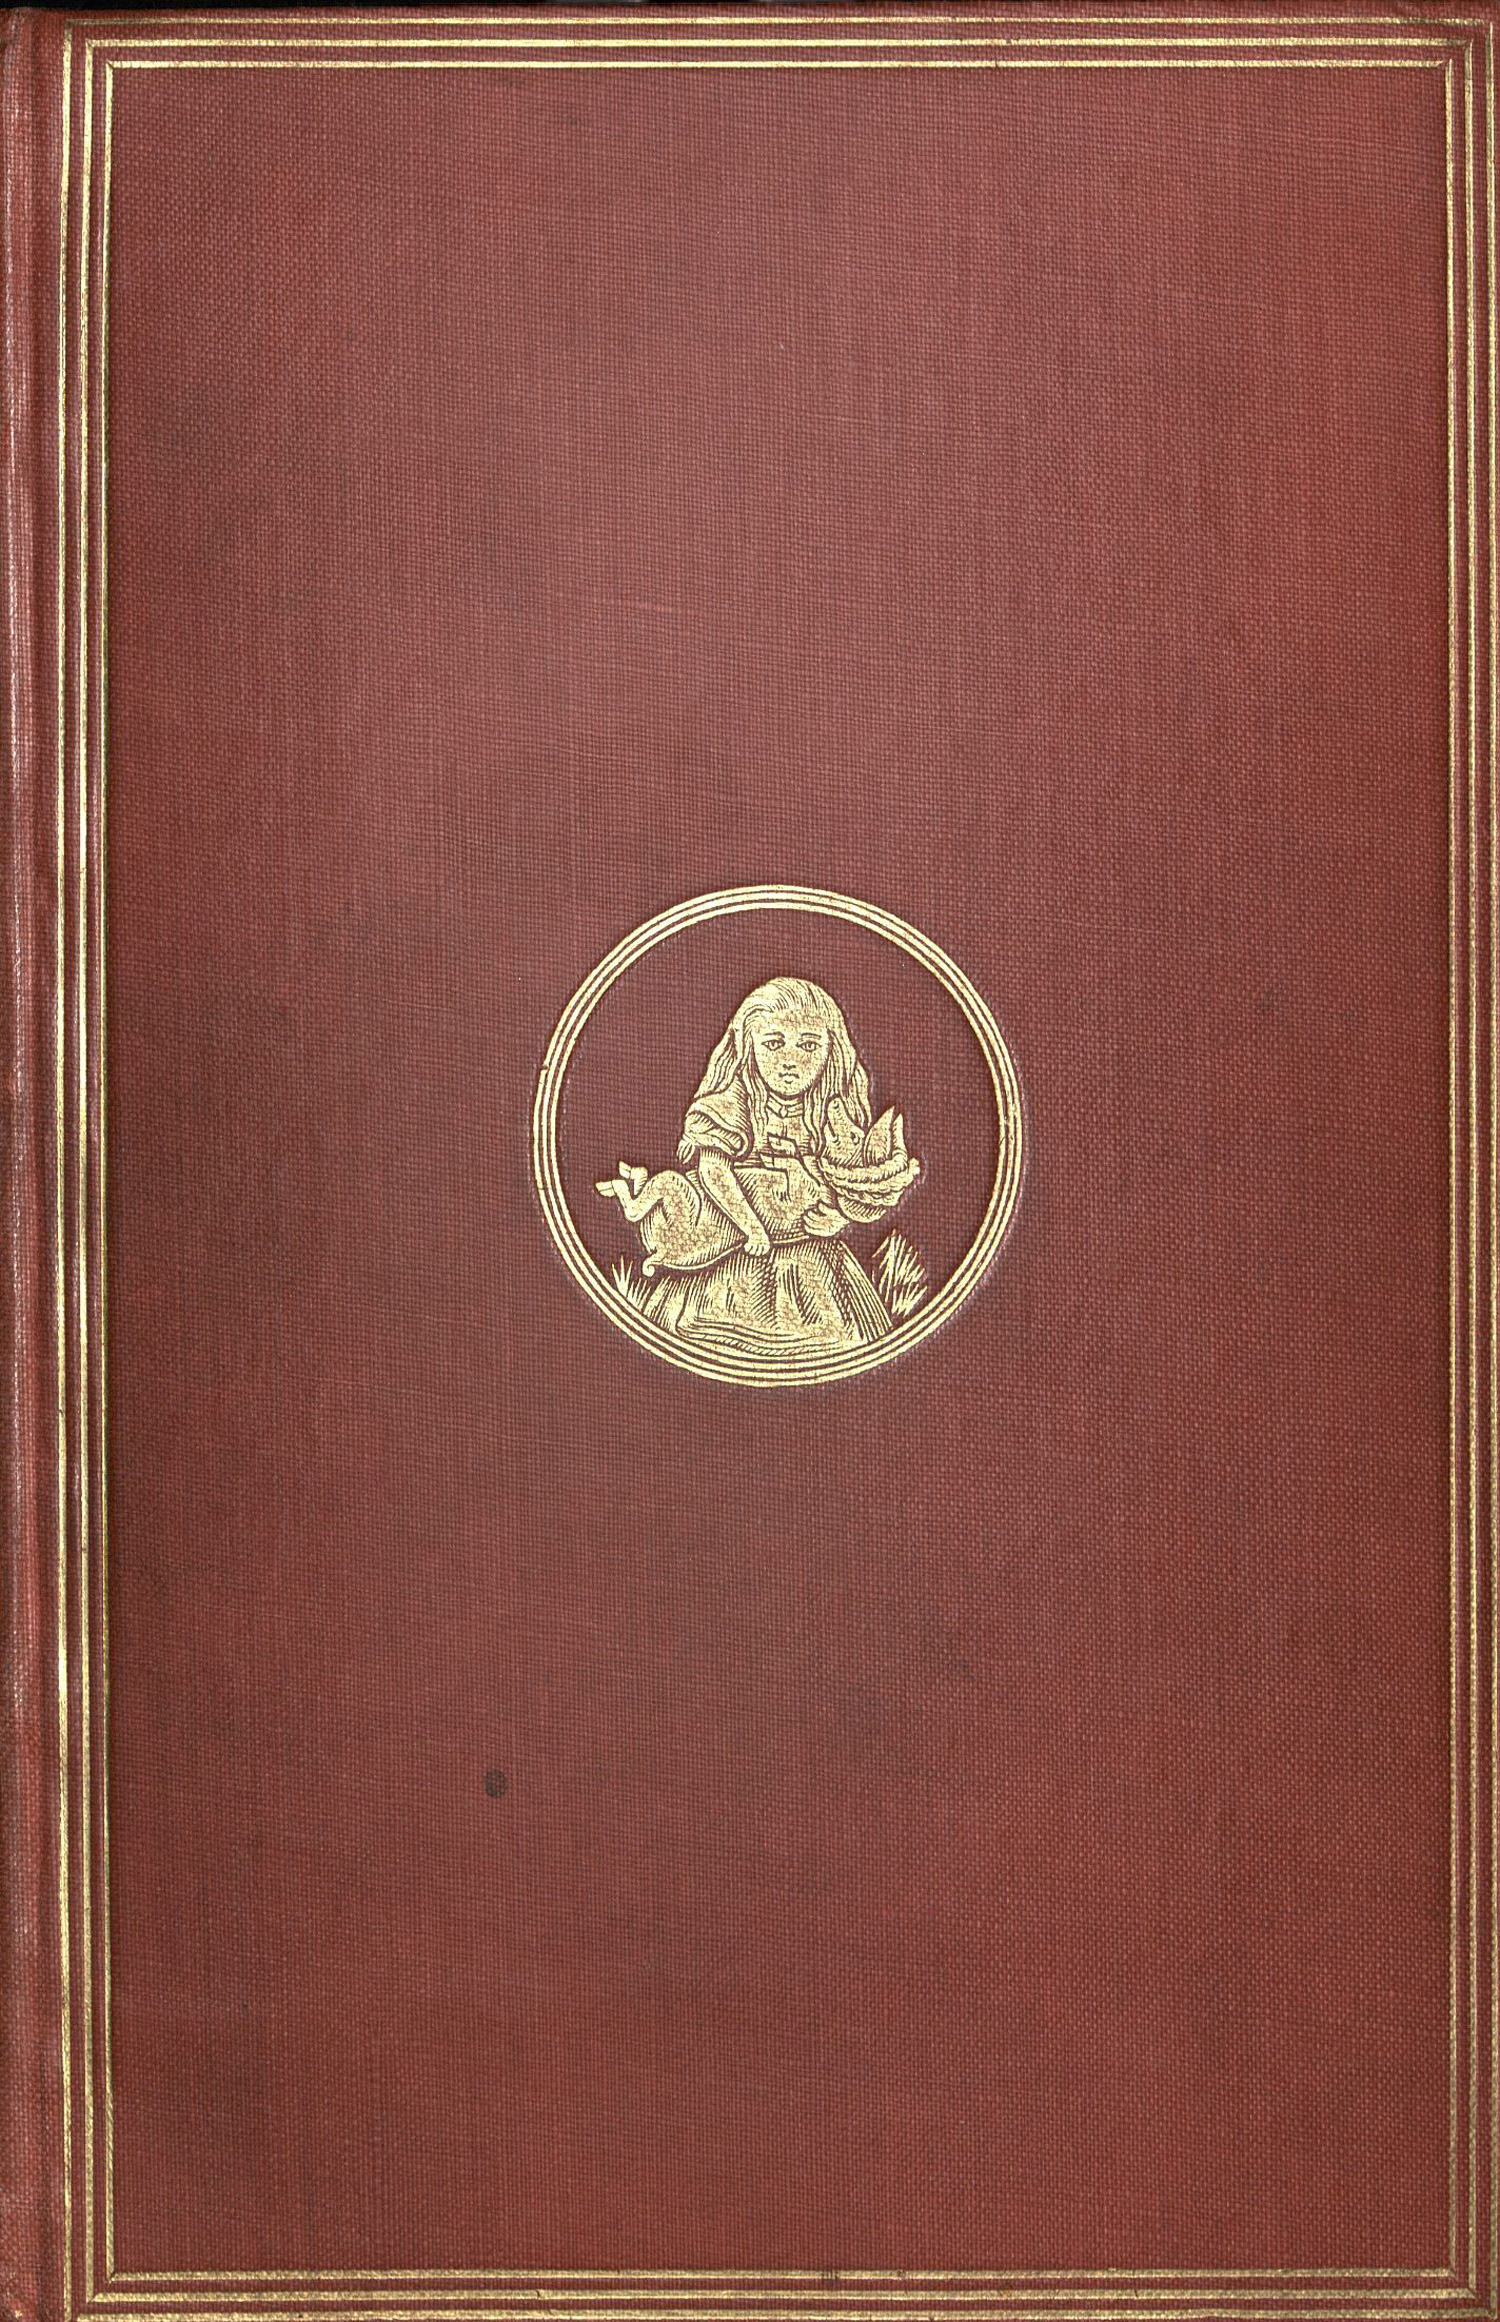 Alice In Wonderland Book Cover Ideas ~ Alices adventures in wonderland alice wiki fandom powered by wikia